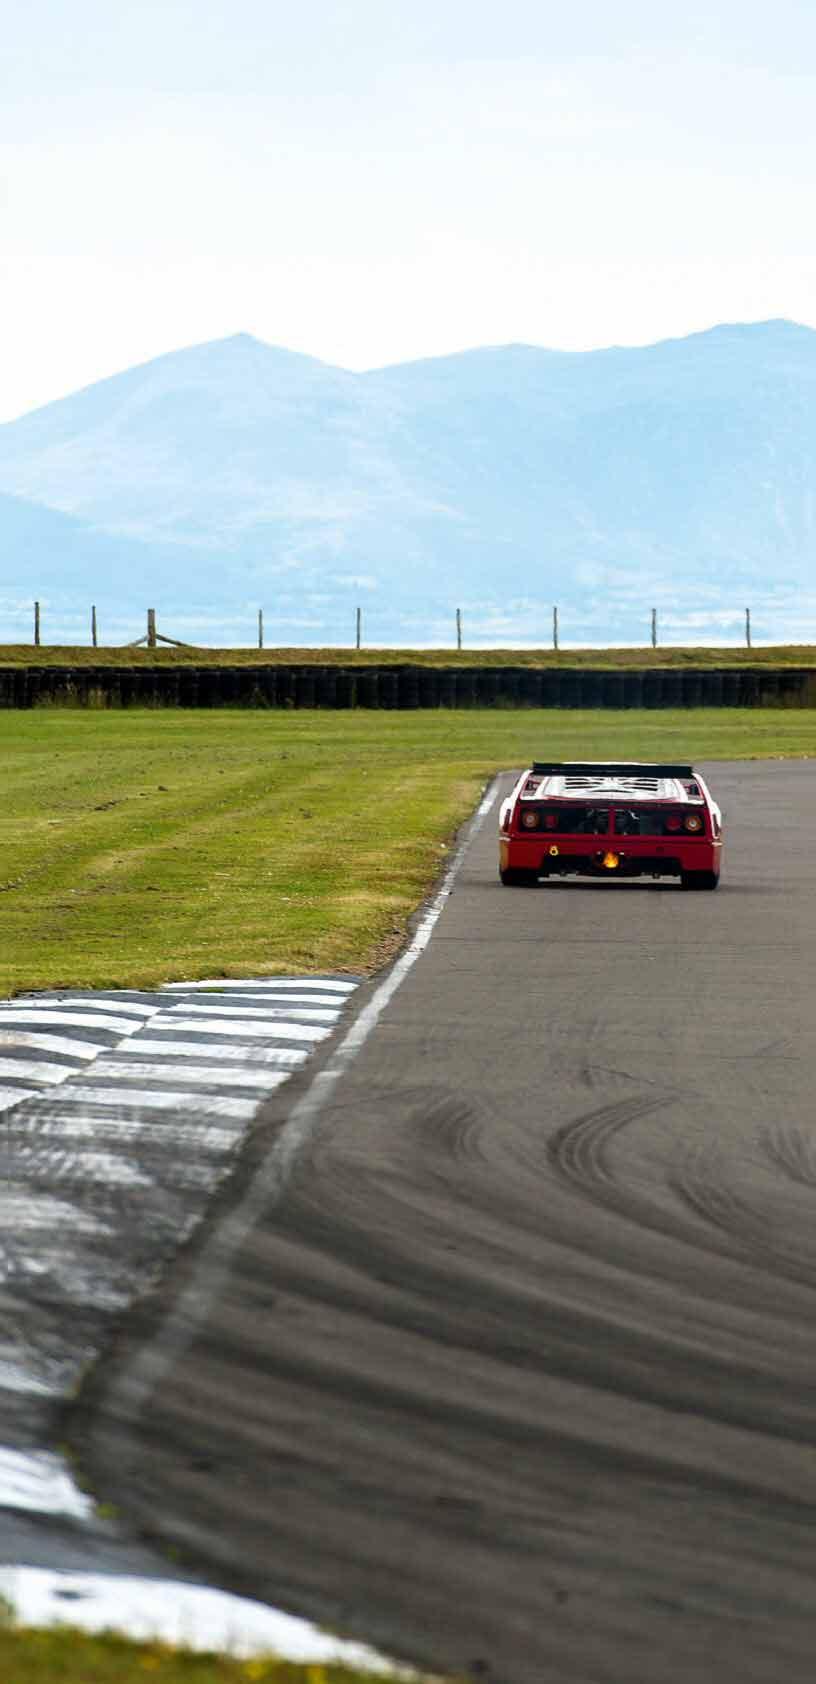 Ferrari F40LM